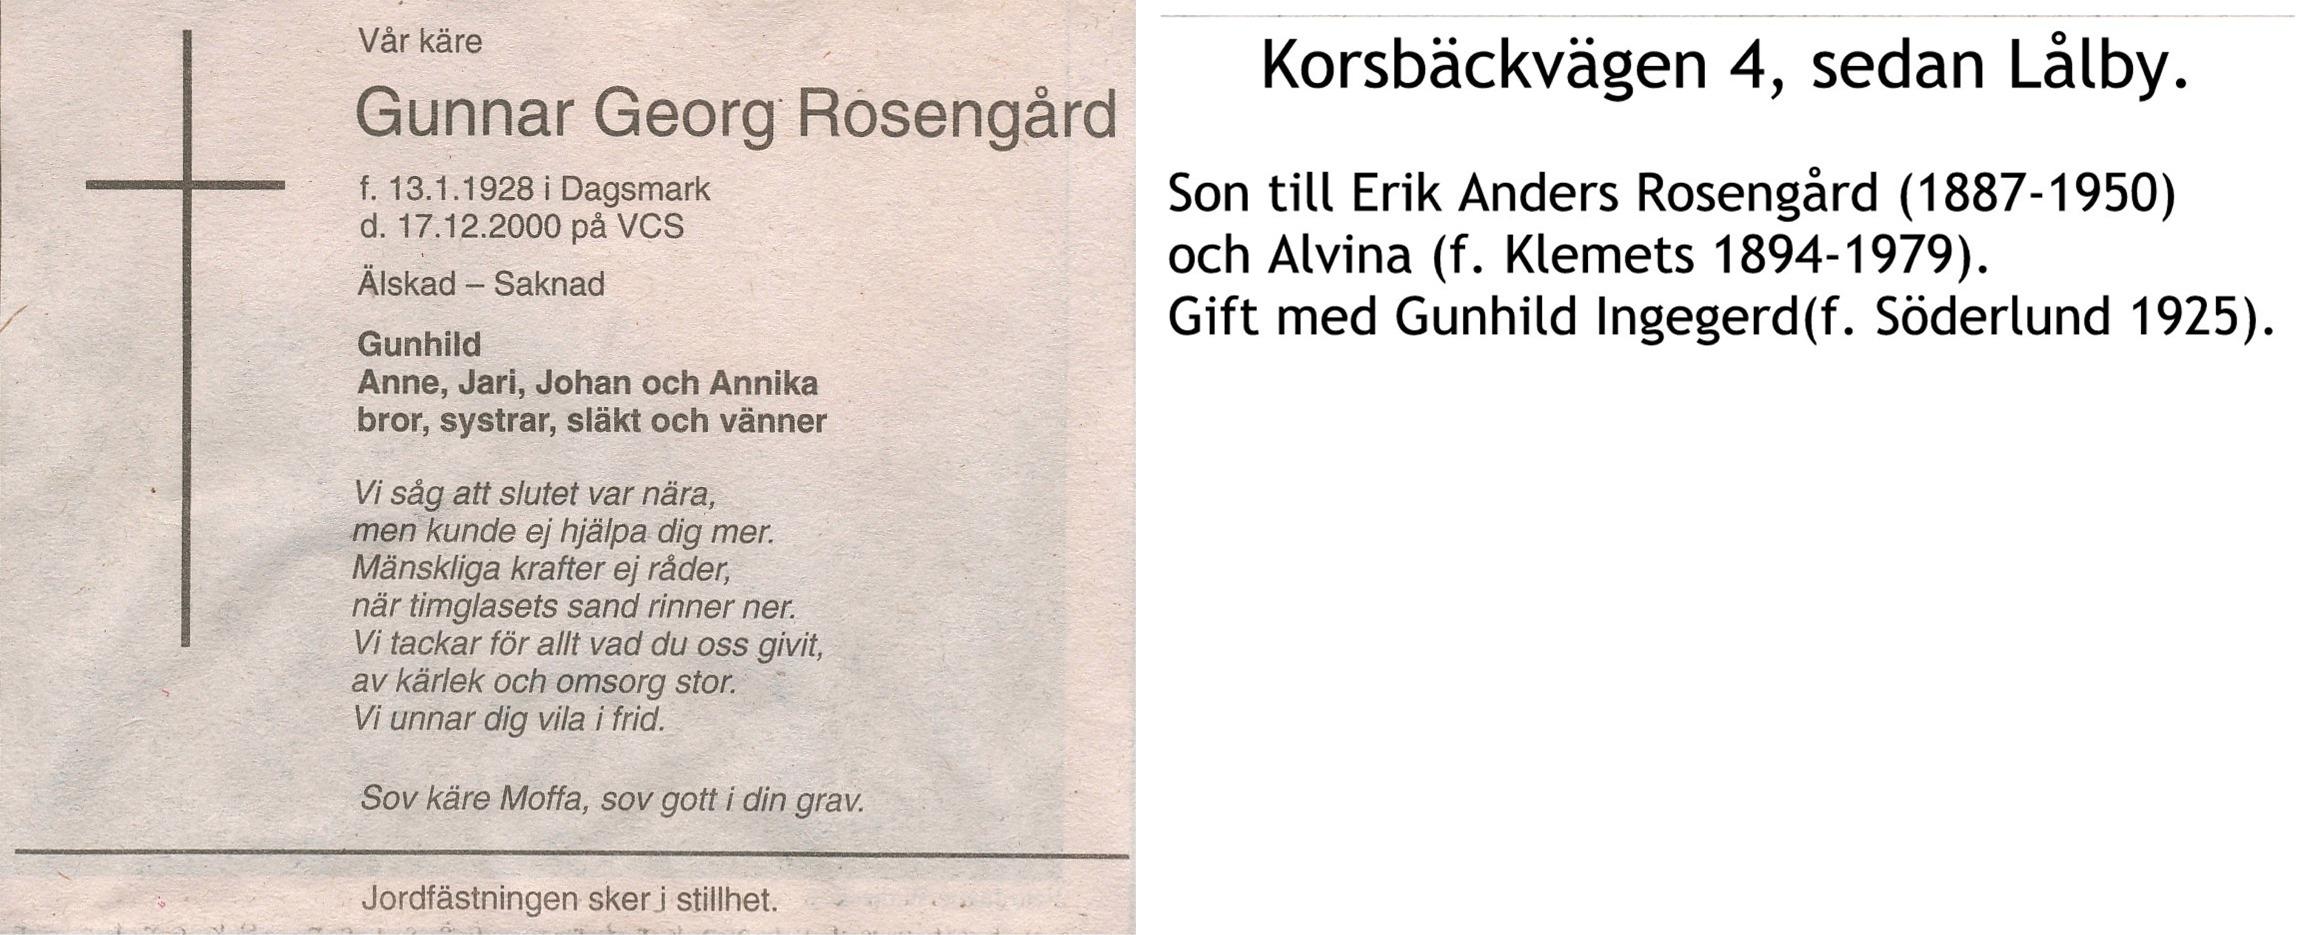 Rosengård Gunnar